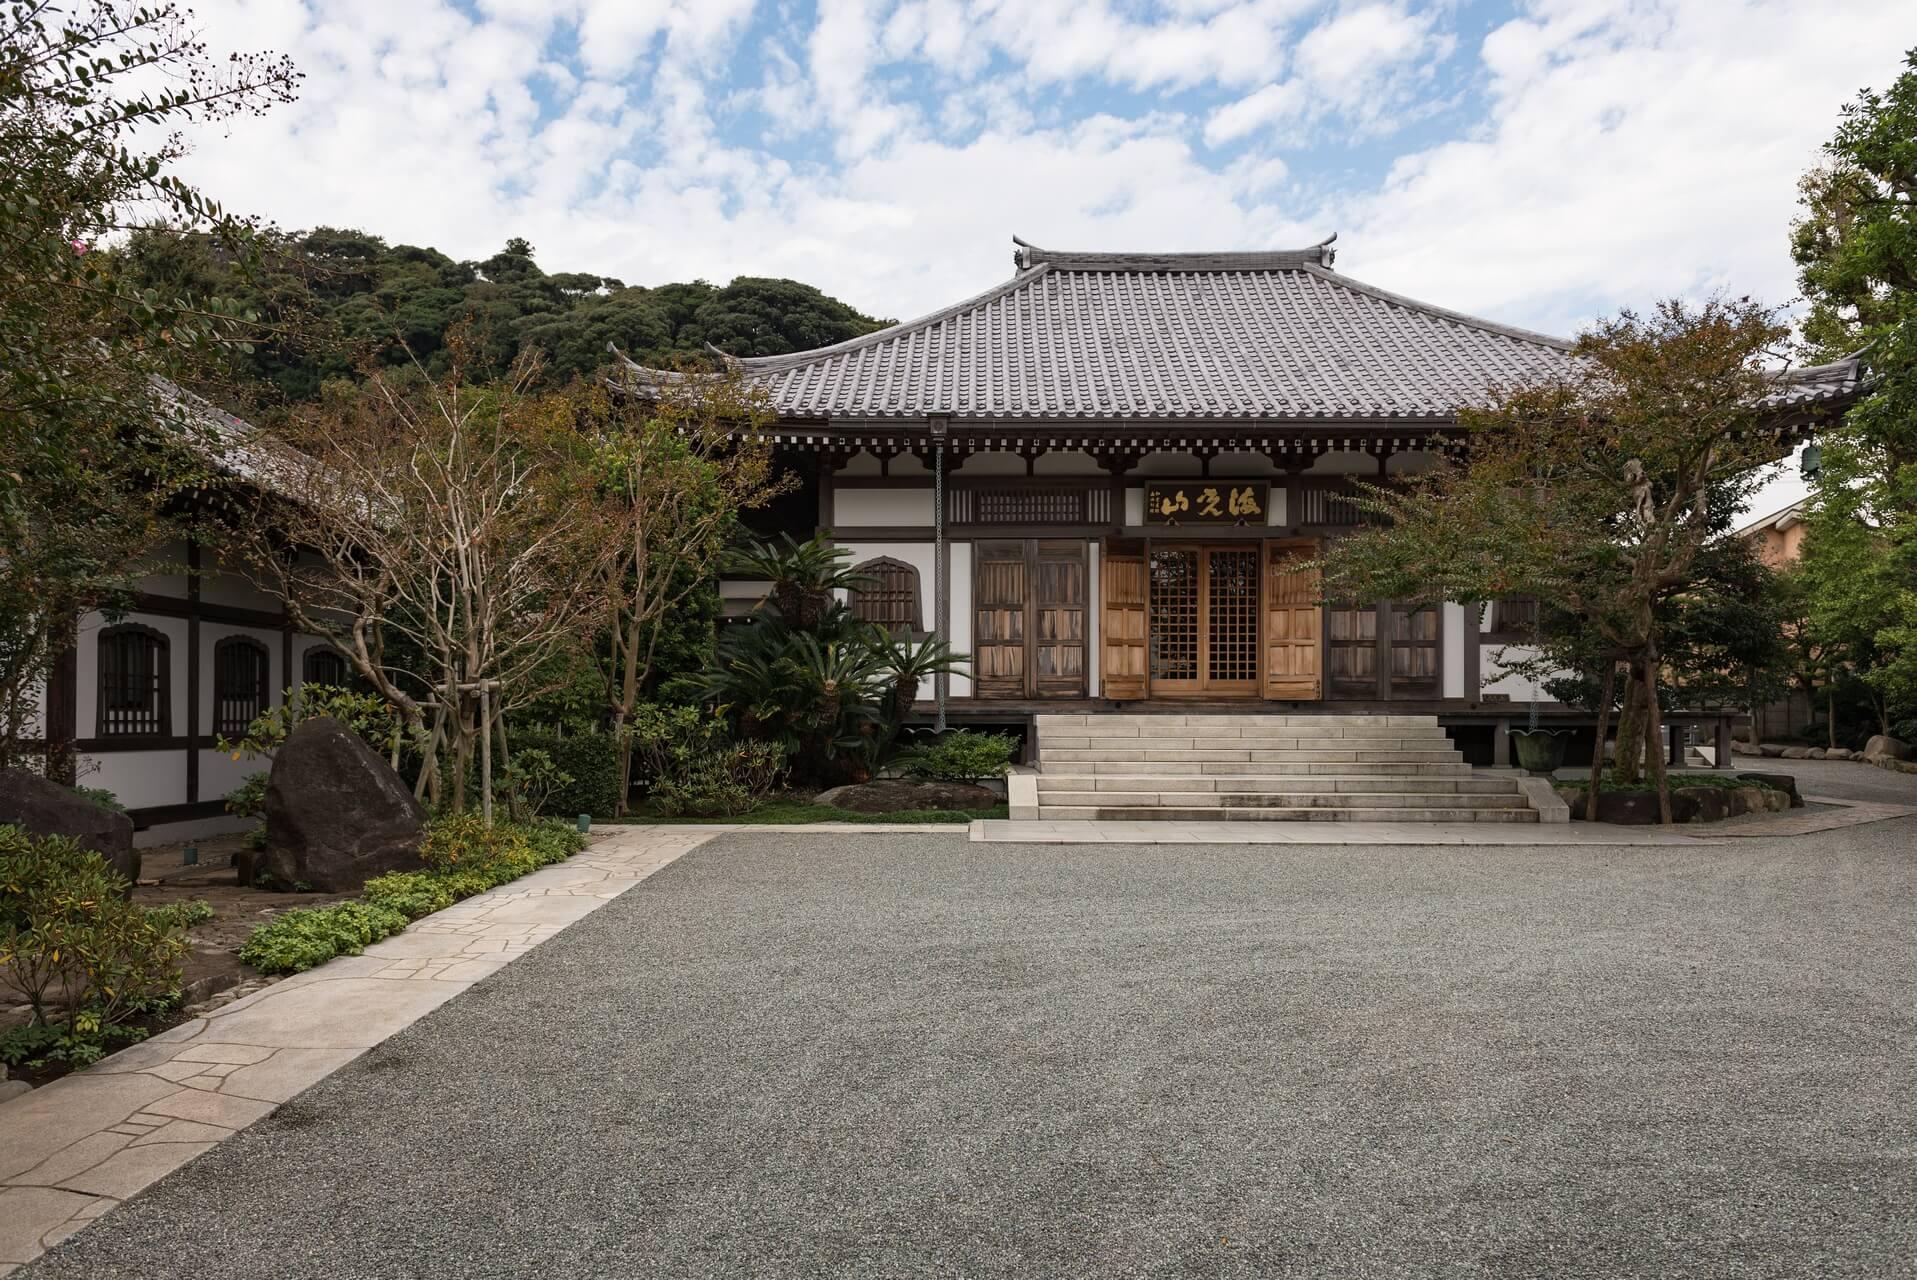 Japan Kamakura Tempel, Fotograf: Steffen Lohse